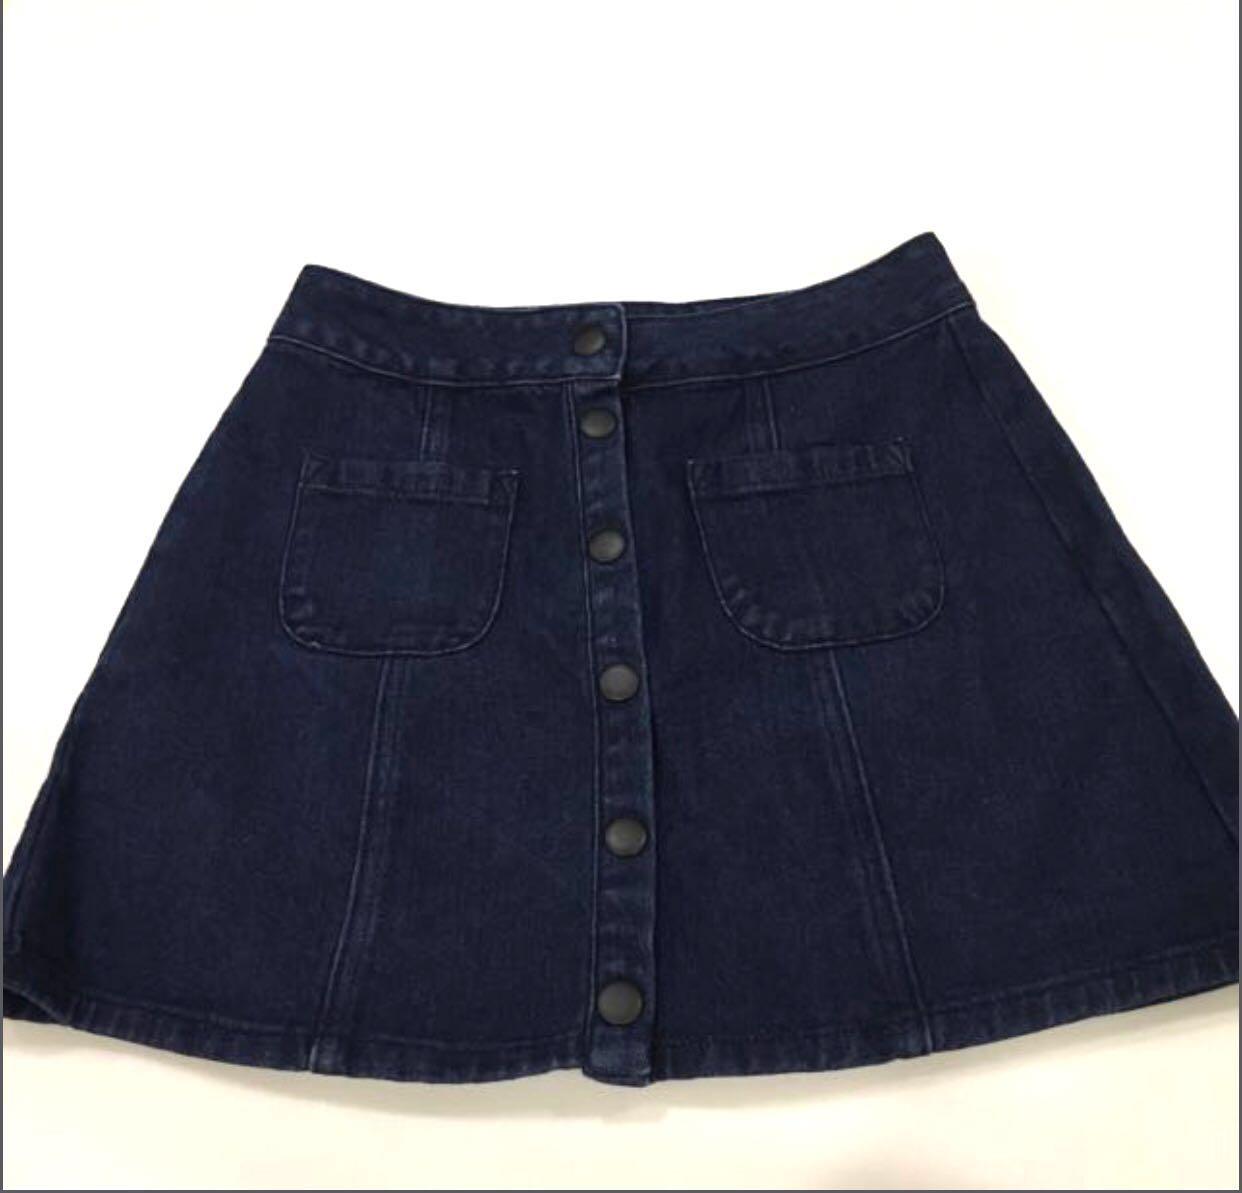 b3249a07cf Black Jean Skirt Brandy Melville – DACC